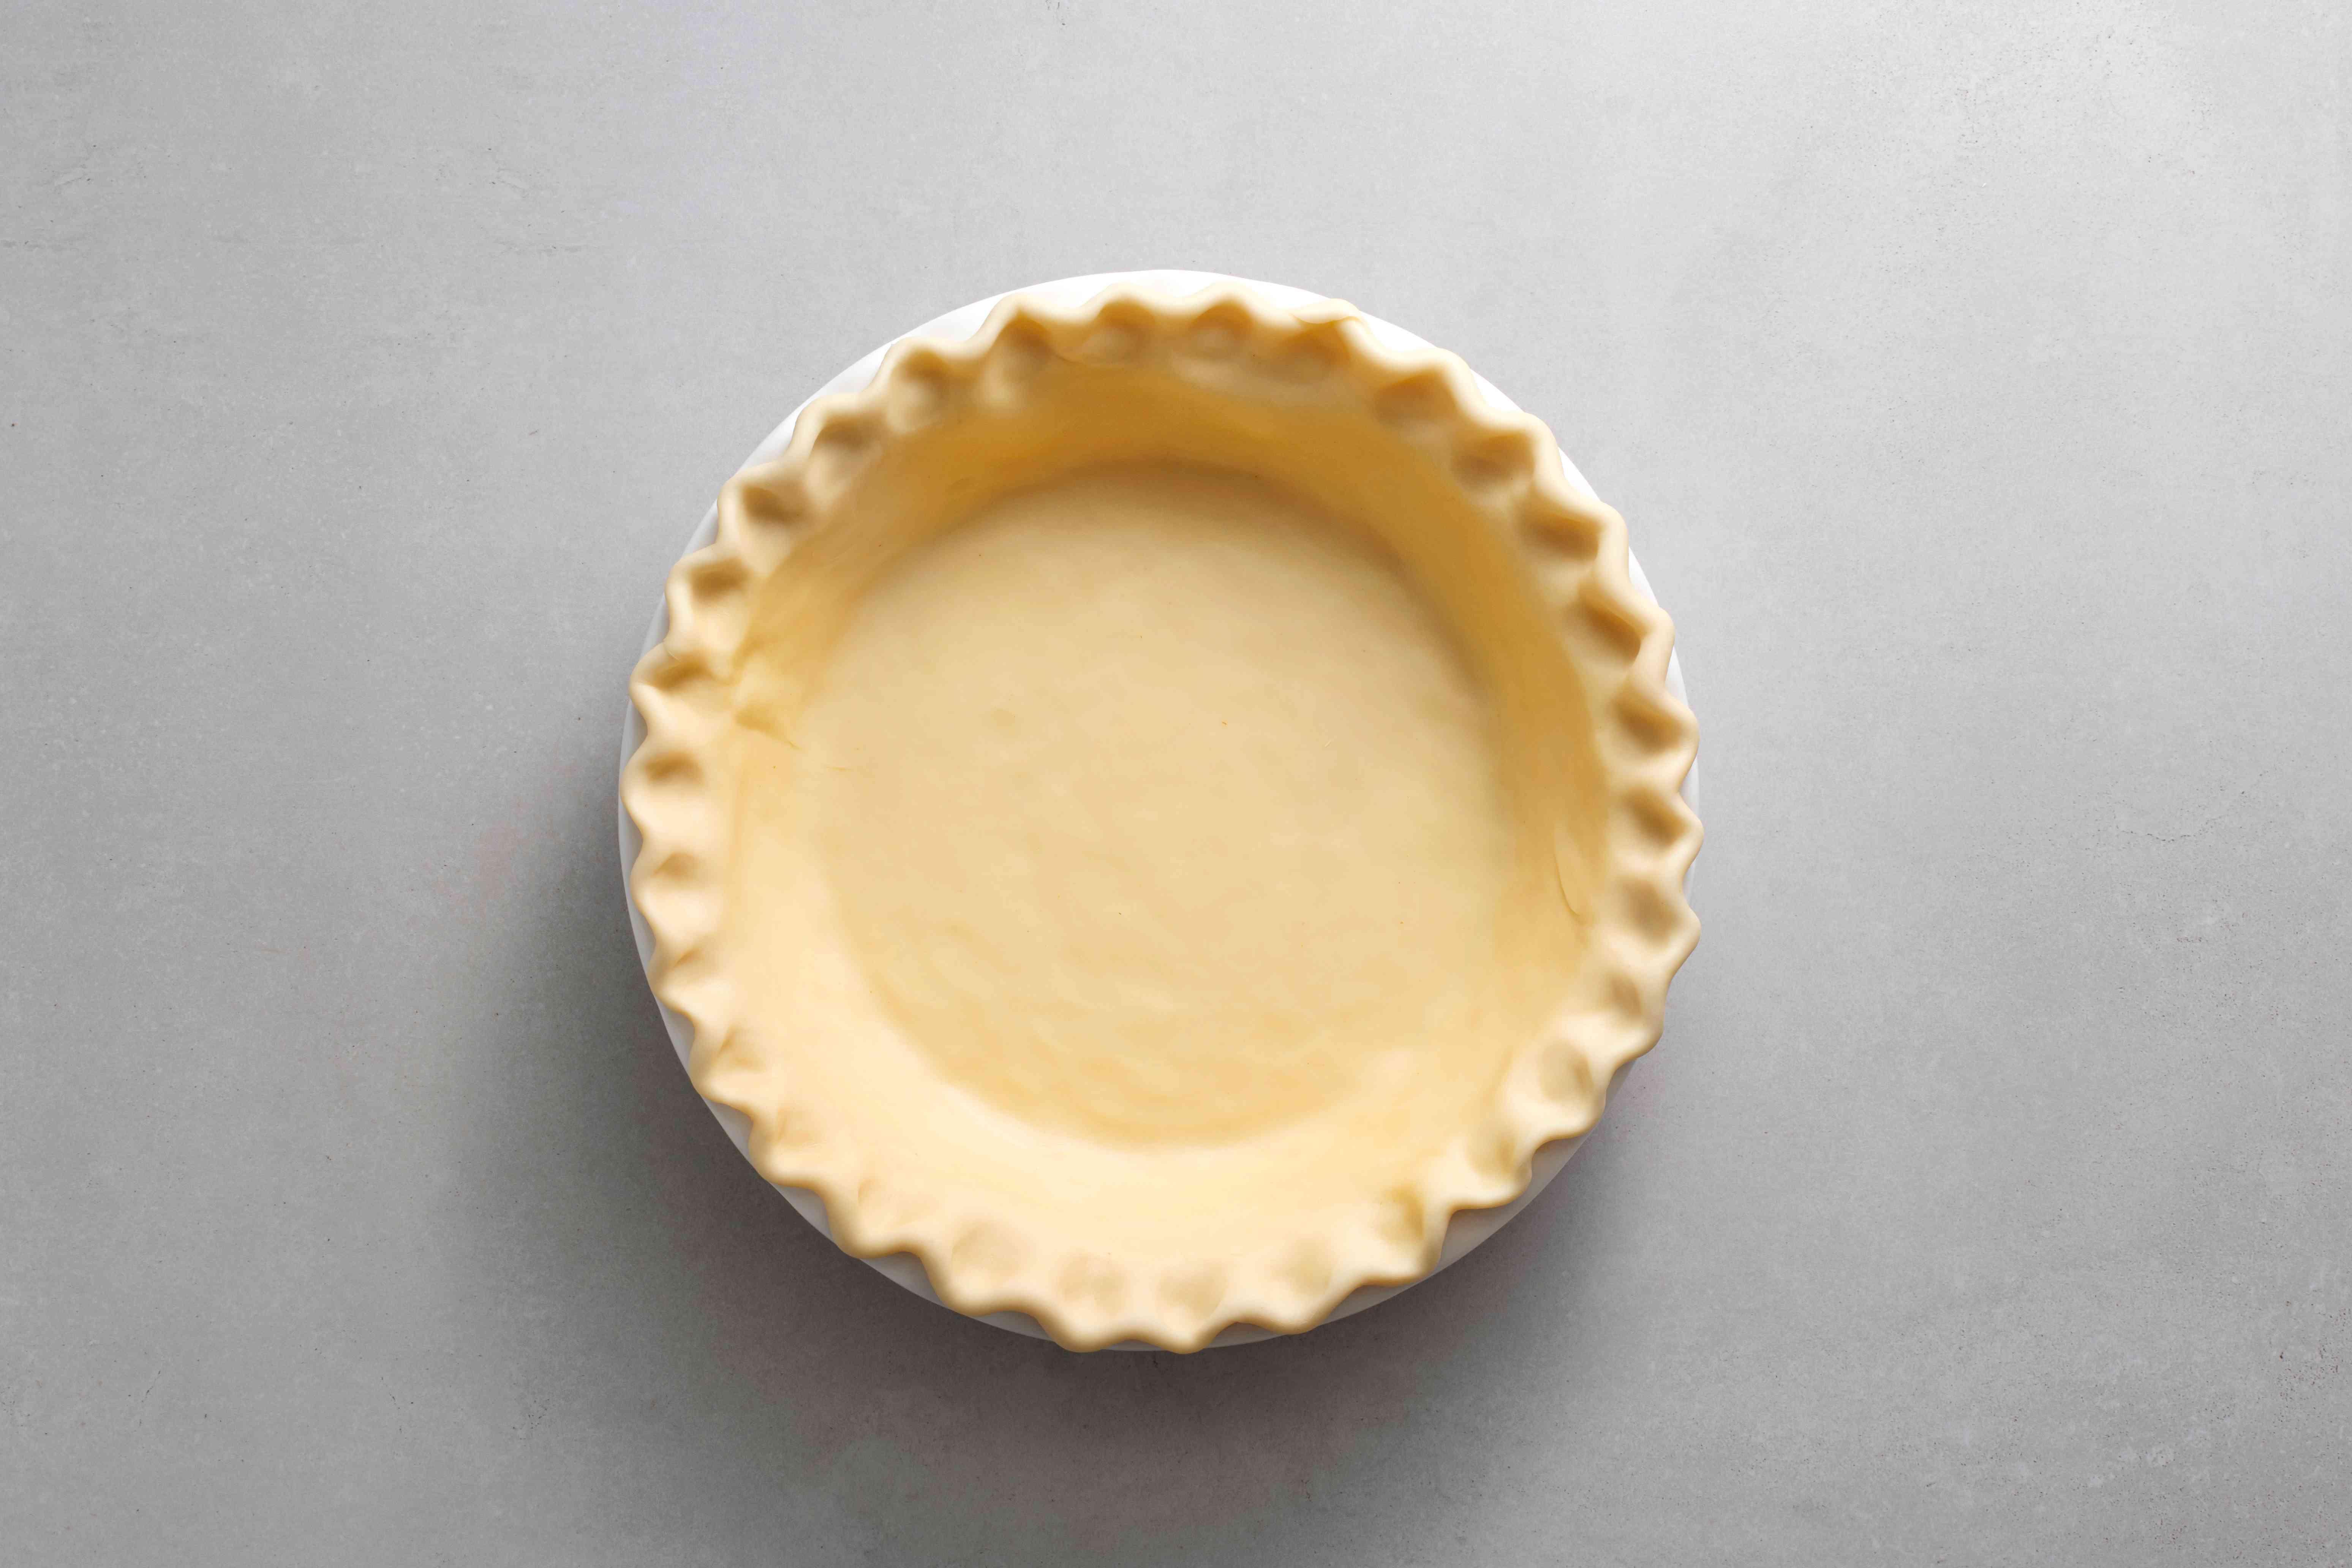 Pie crust shell